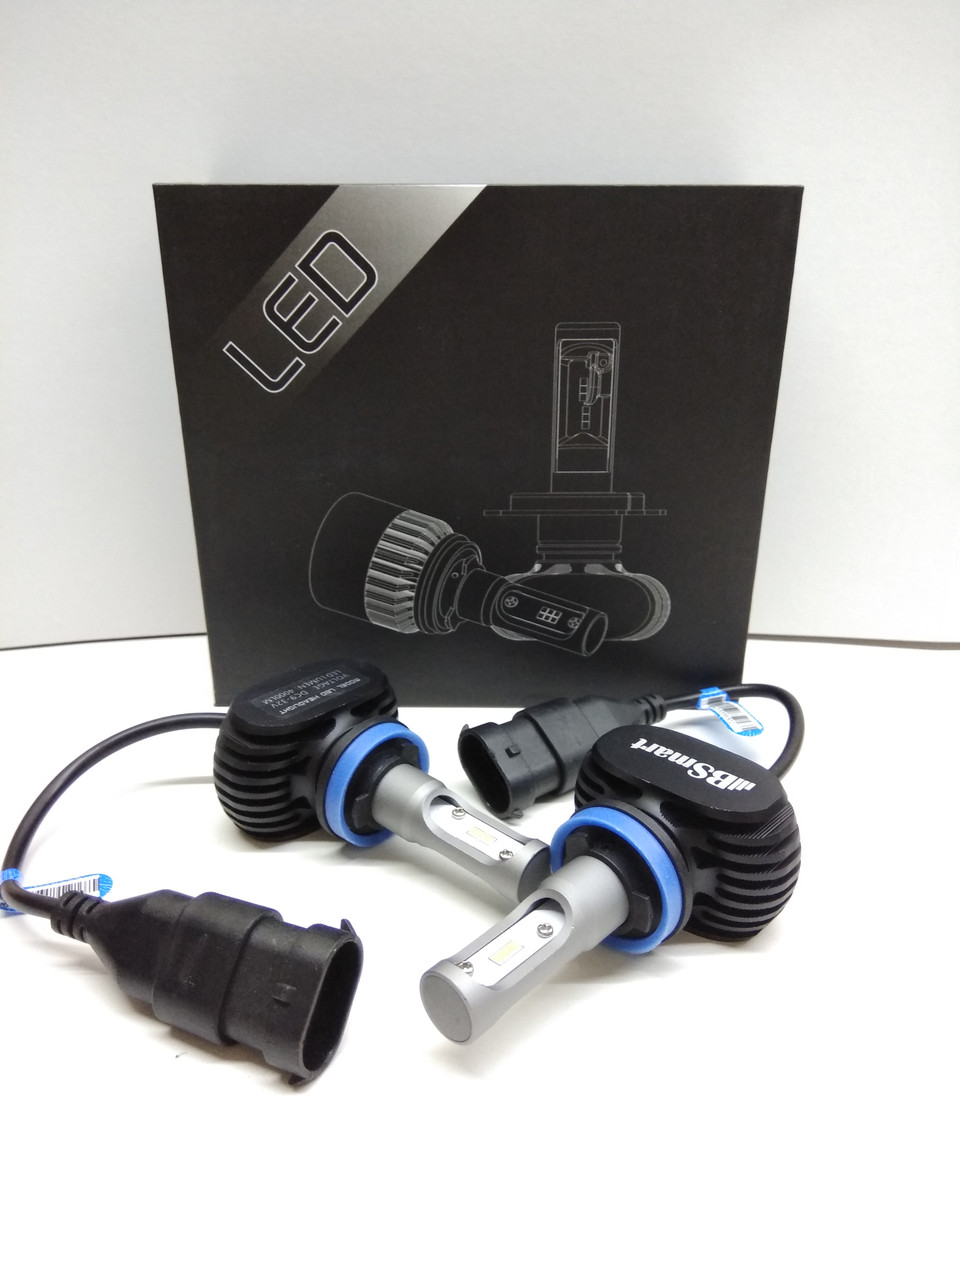 Автолампы LED S1 диод CSP Южная Корея, H16, 8000LM, 50W, 9-32V